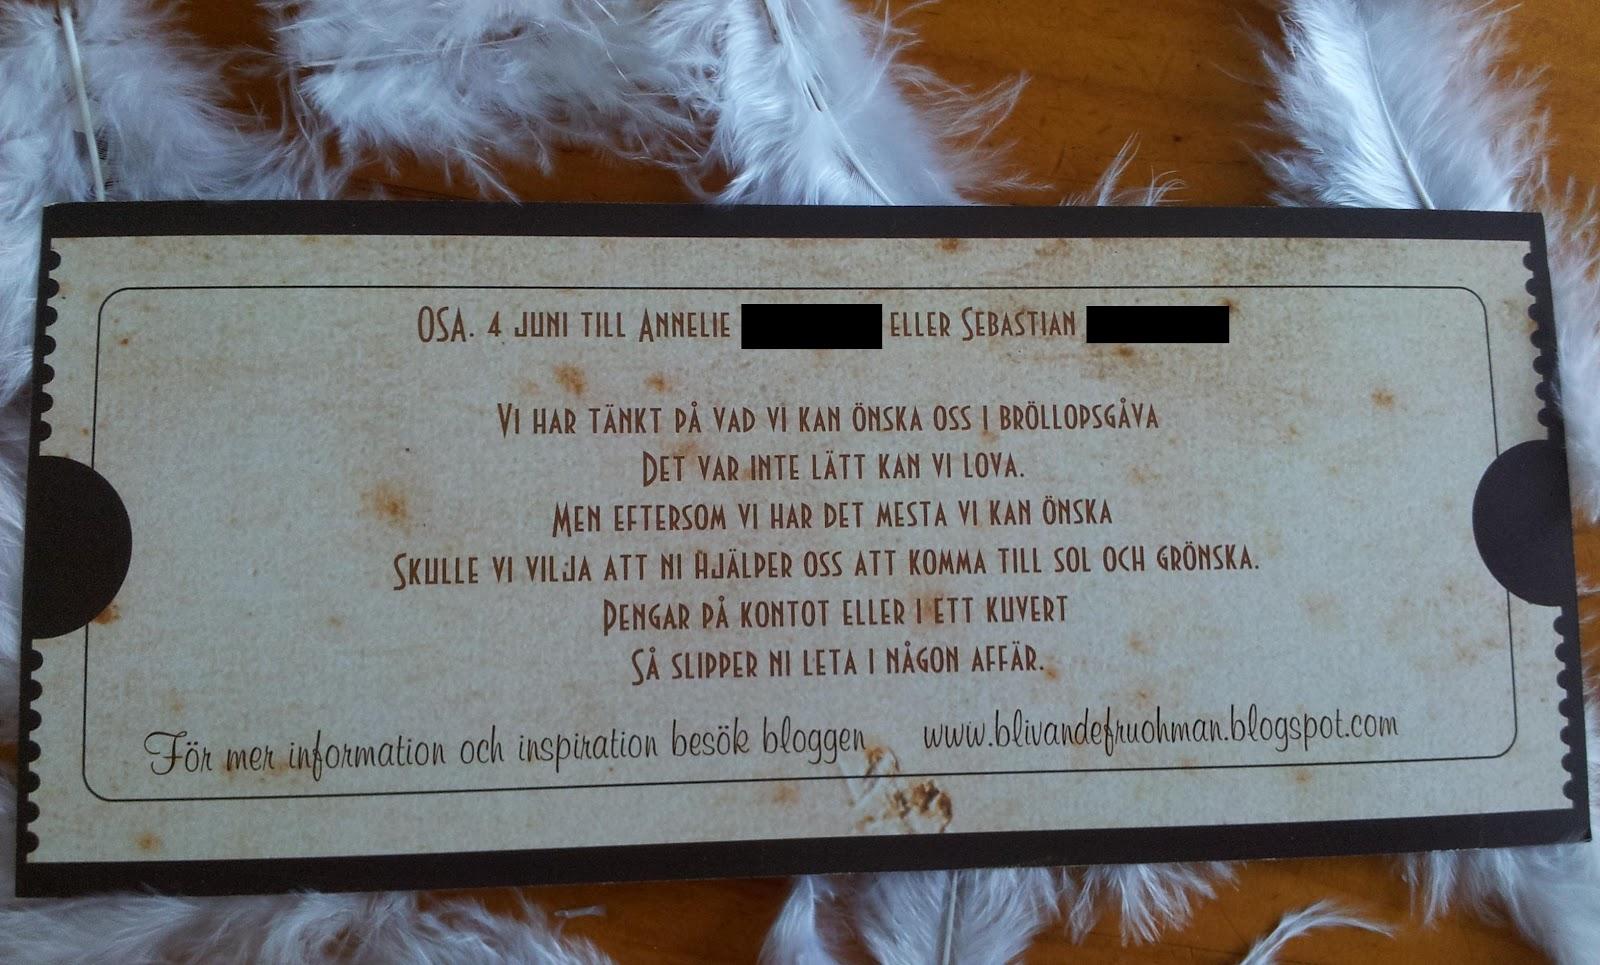 inbjudan 30 års fest rim Blivande fru Öhman: Väskan och inbjudan inbjudan 30 års fest rim